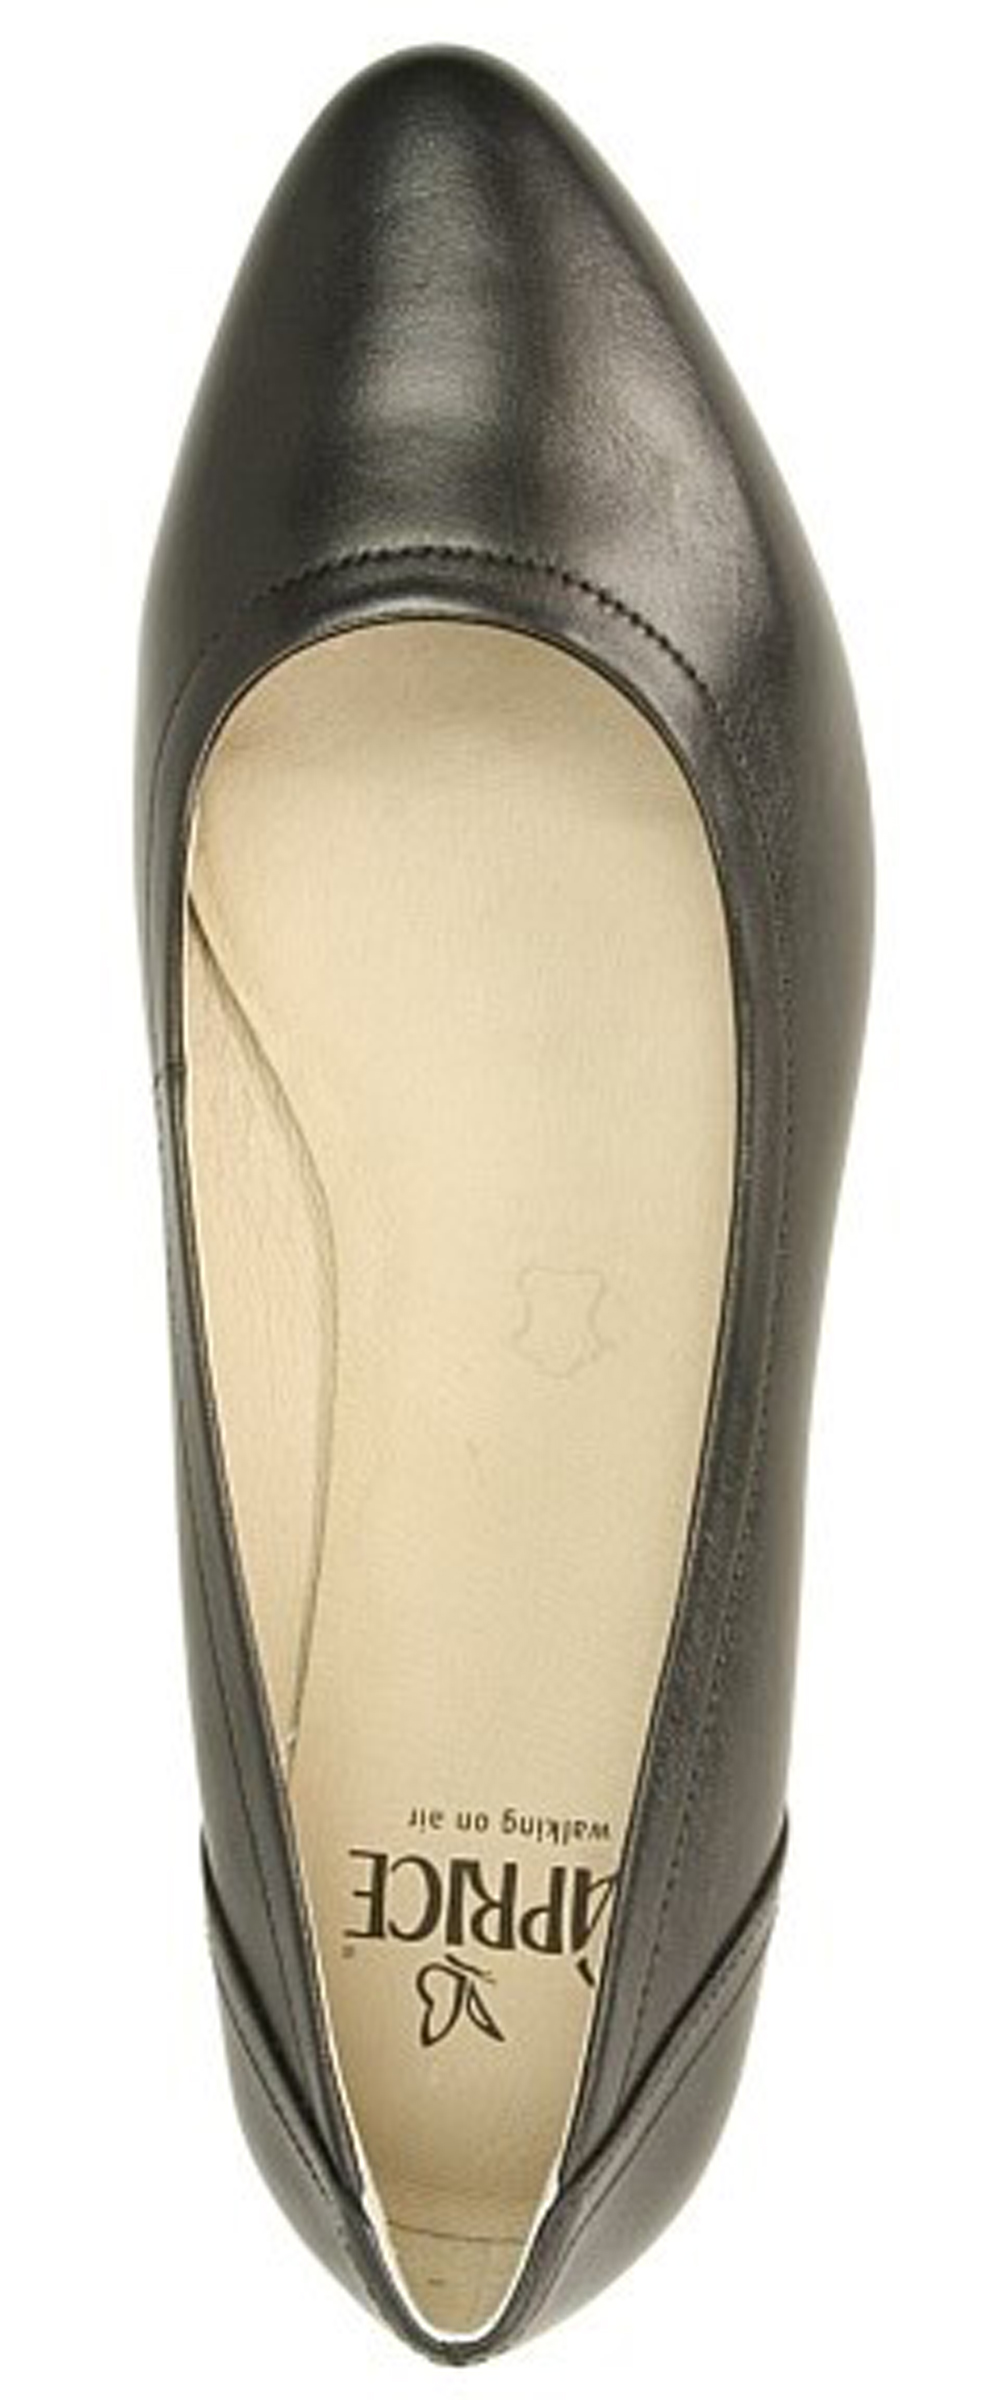 BALERINY CAPRICE 9-22113- wysokosc_obcasa 1.5 cm